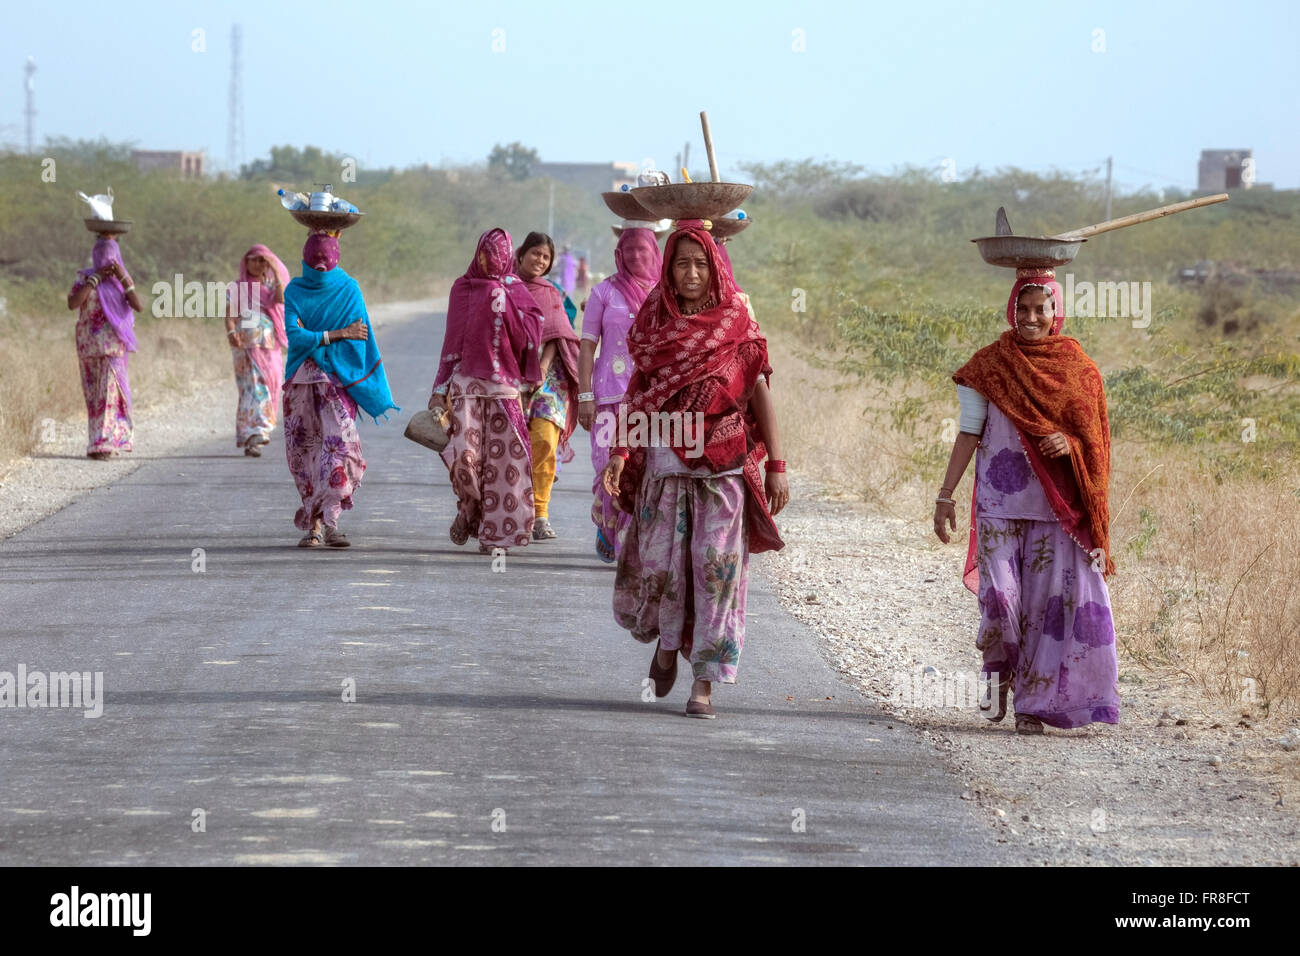 women on their way to work through the countryside near Jodhpur, India - Stock Image